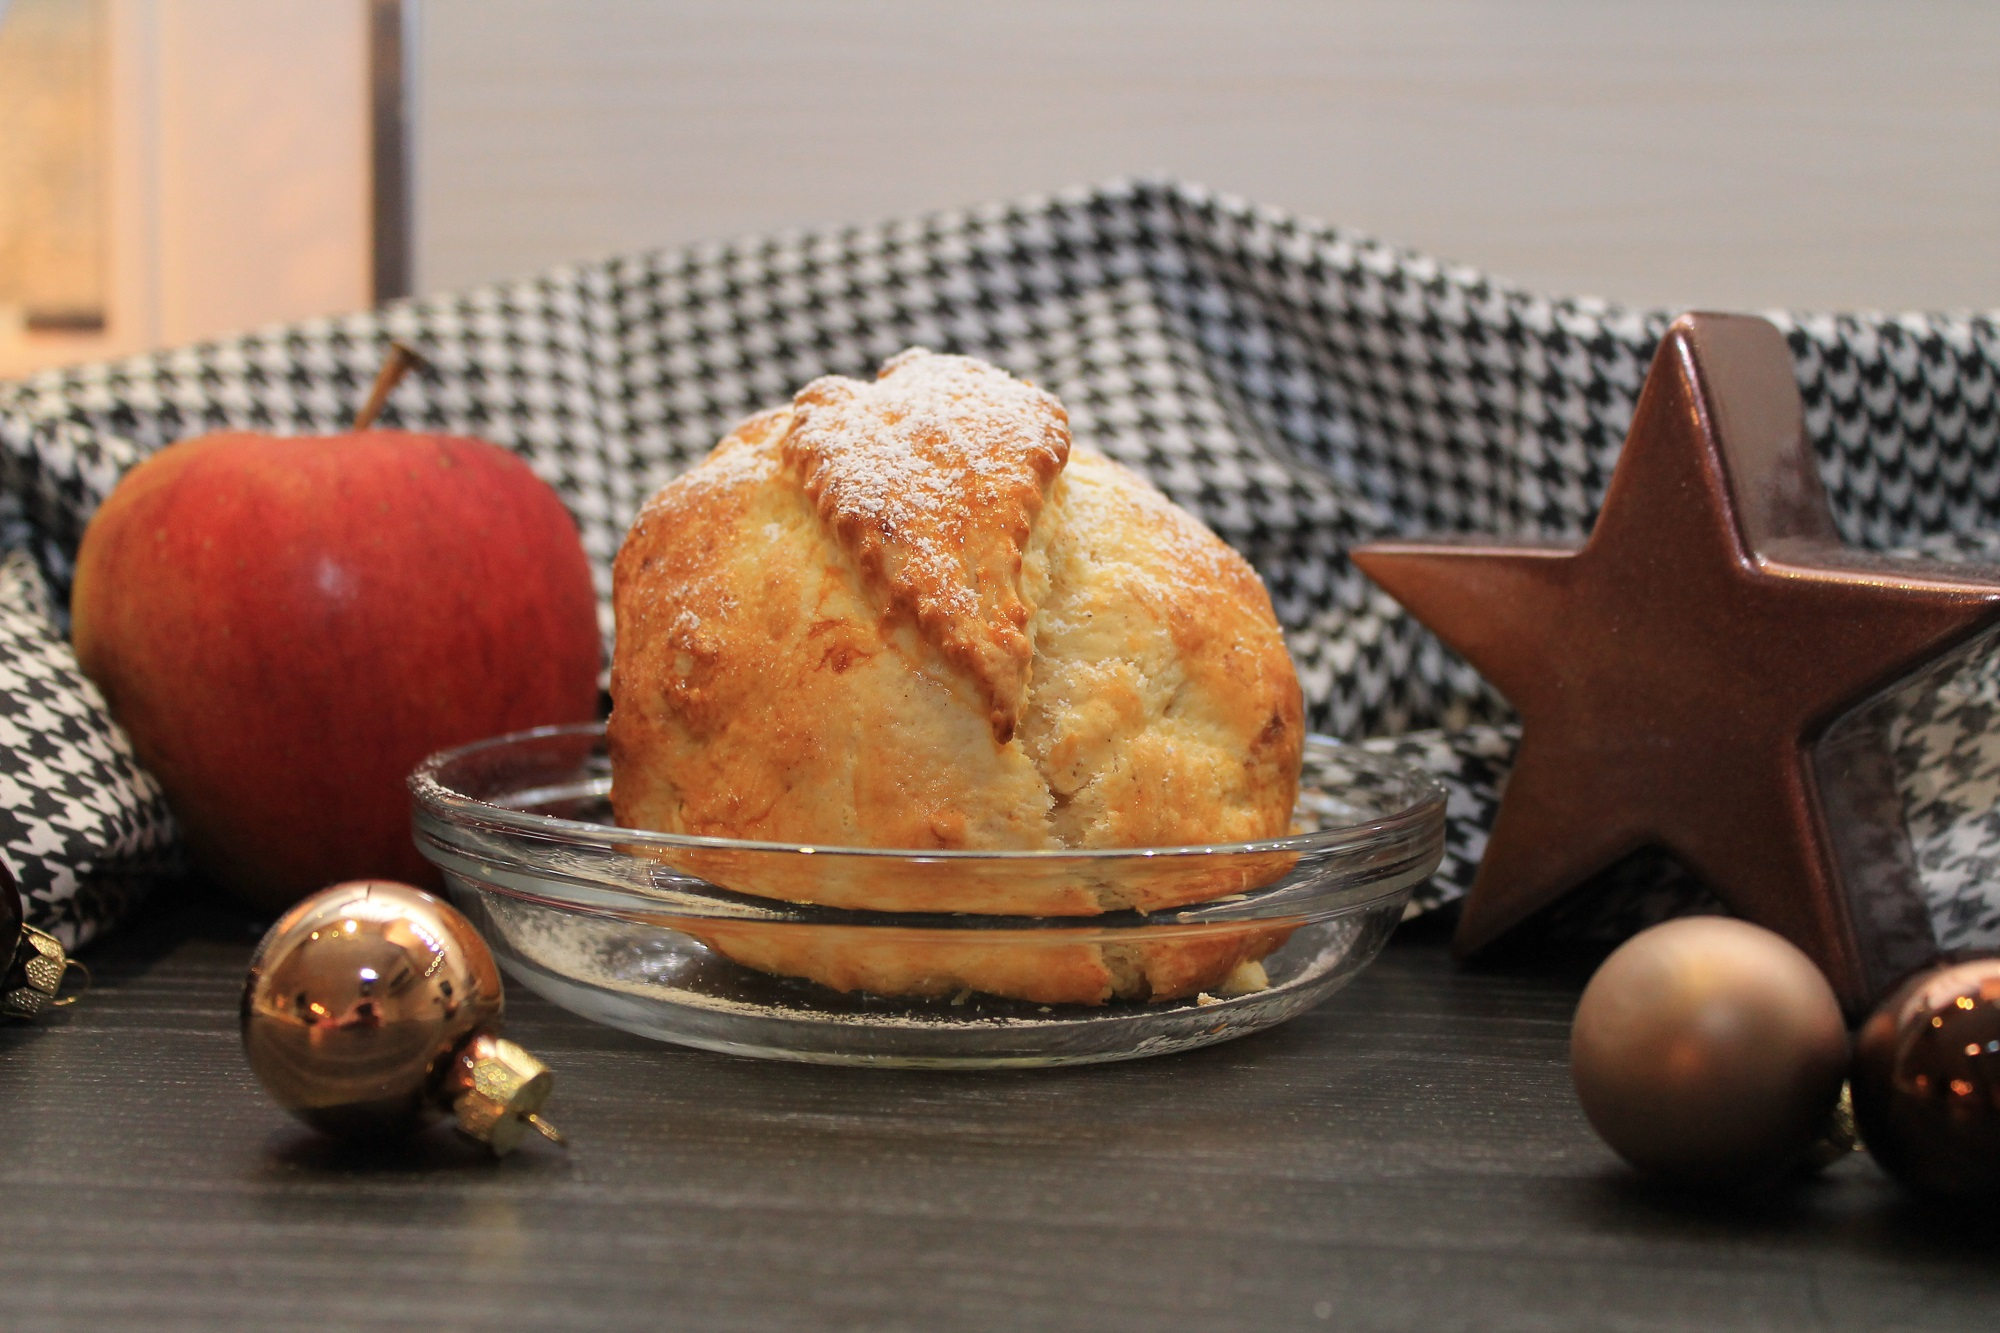 Bratapfel ohne Nuss